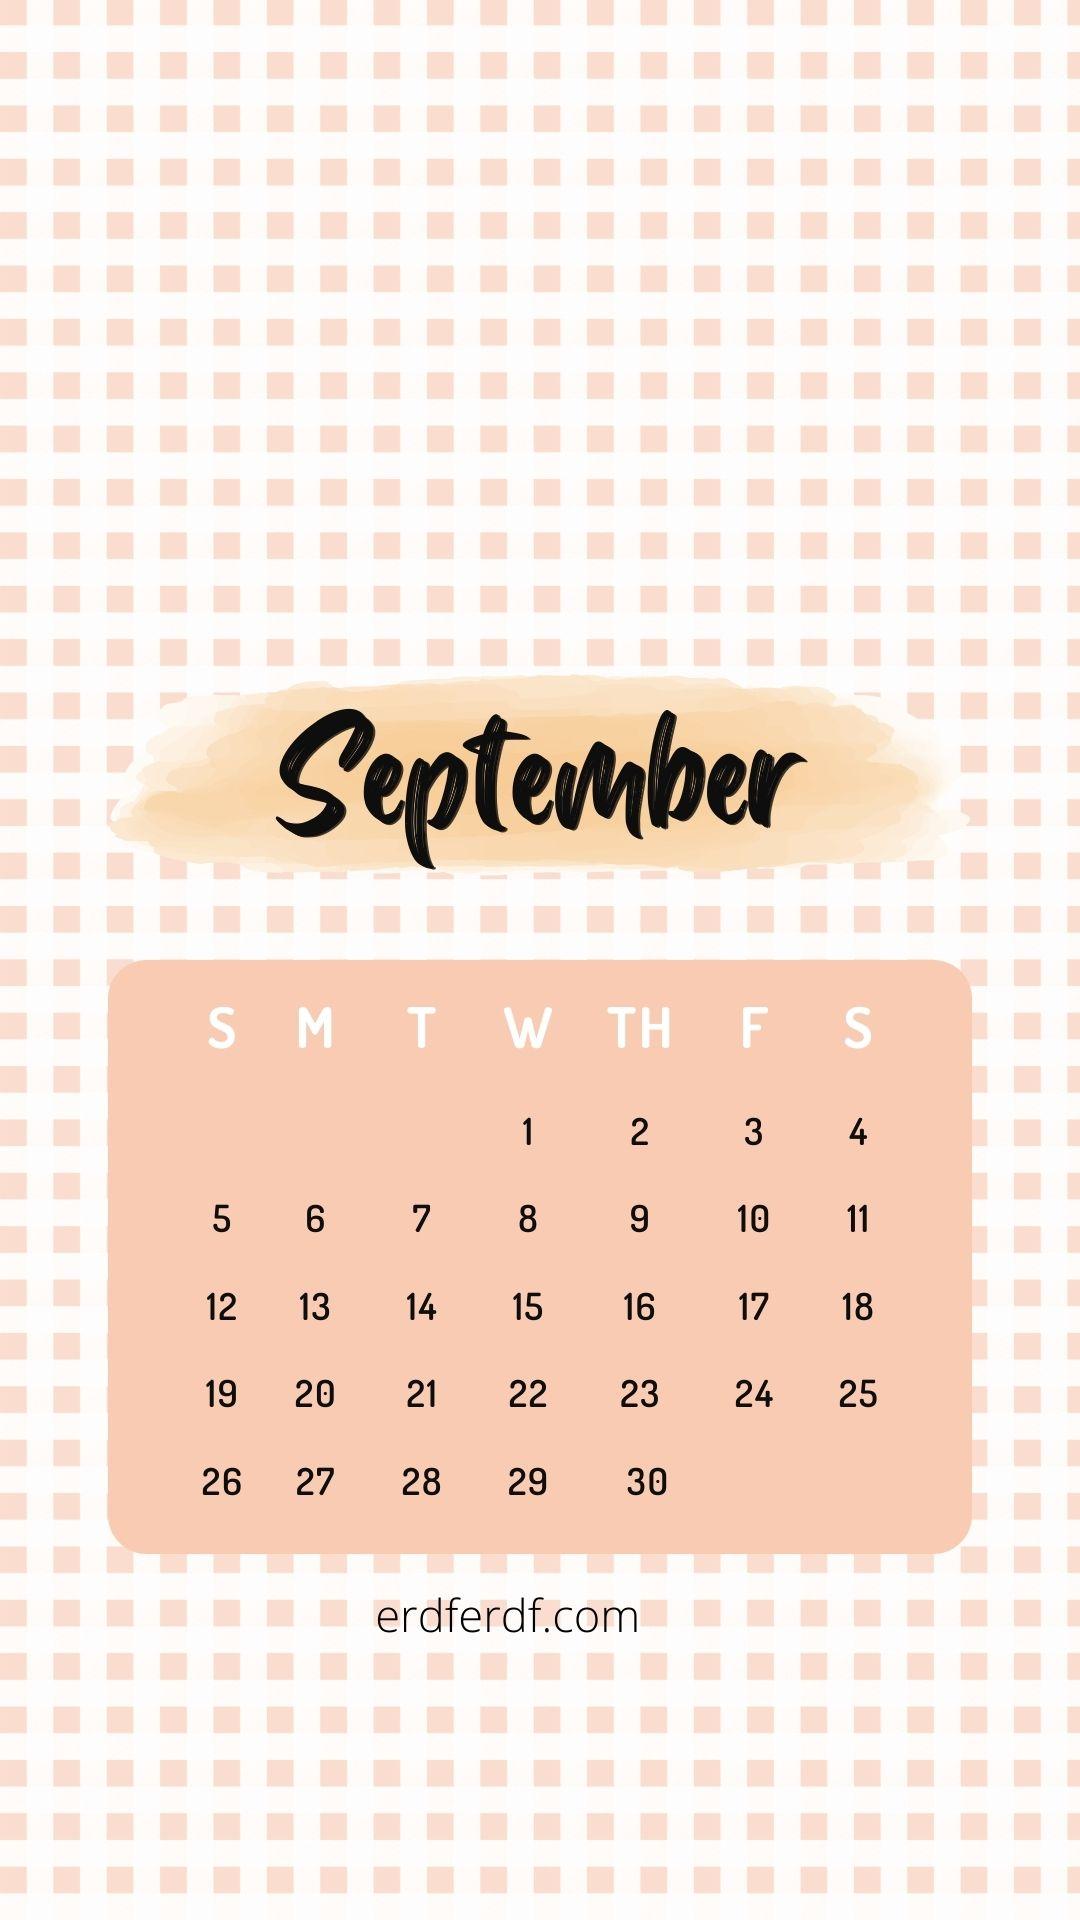 Wallpaper Calendar Iphone 13 September Cute Orange